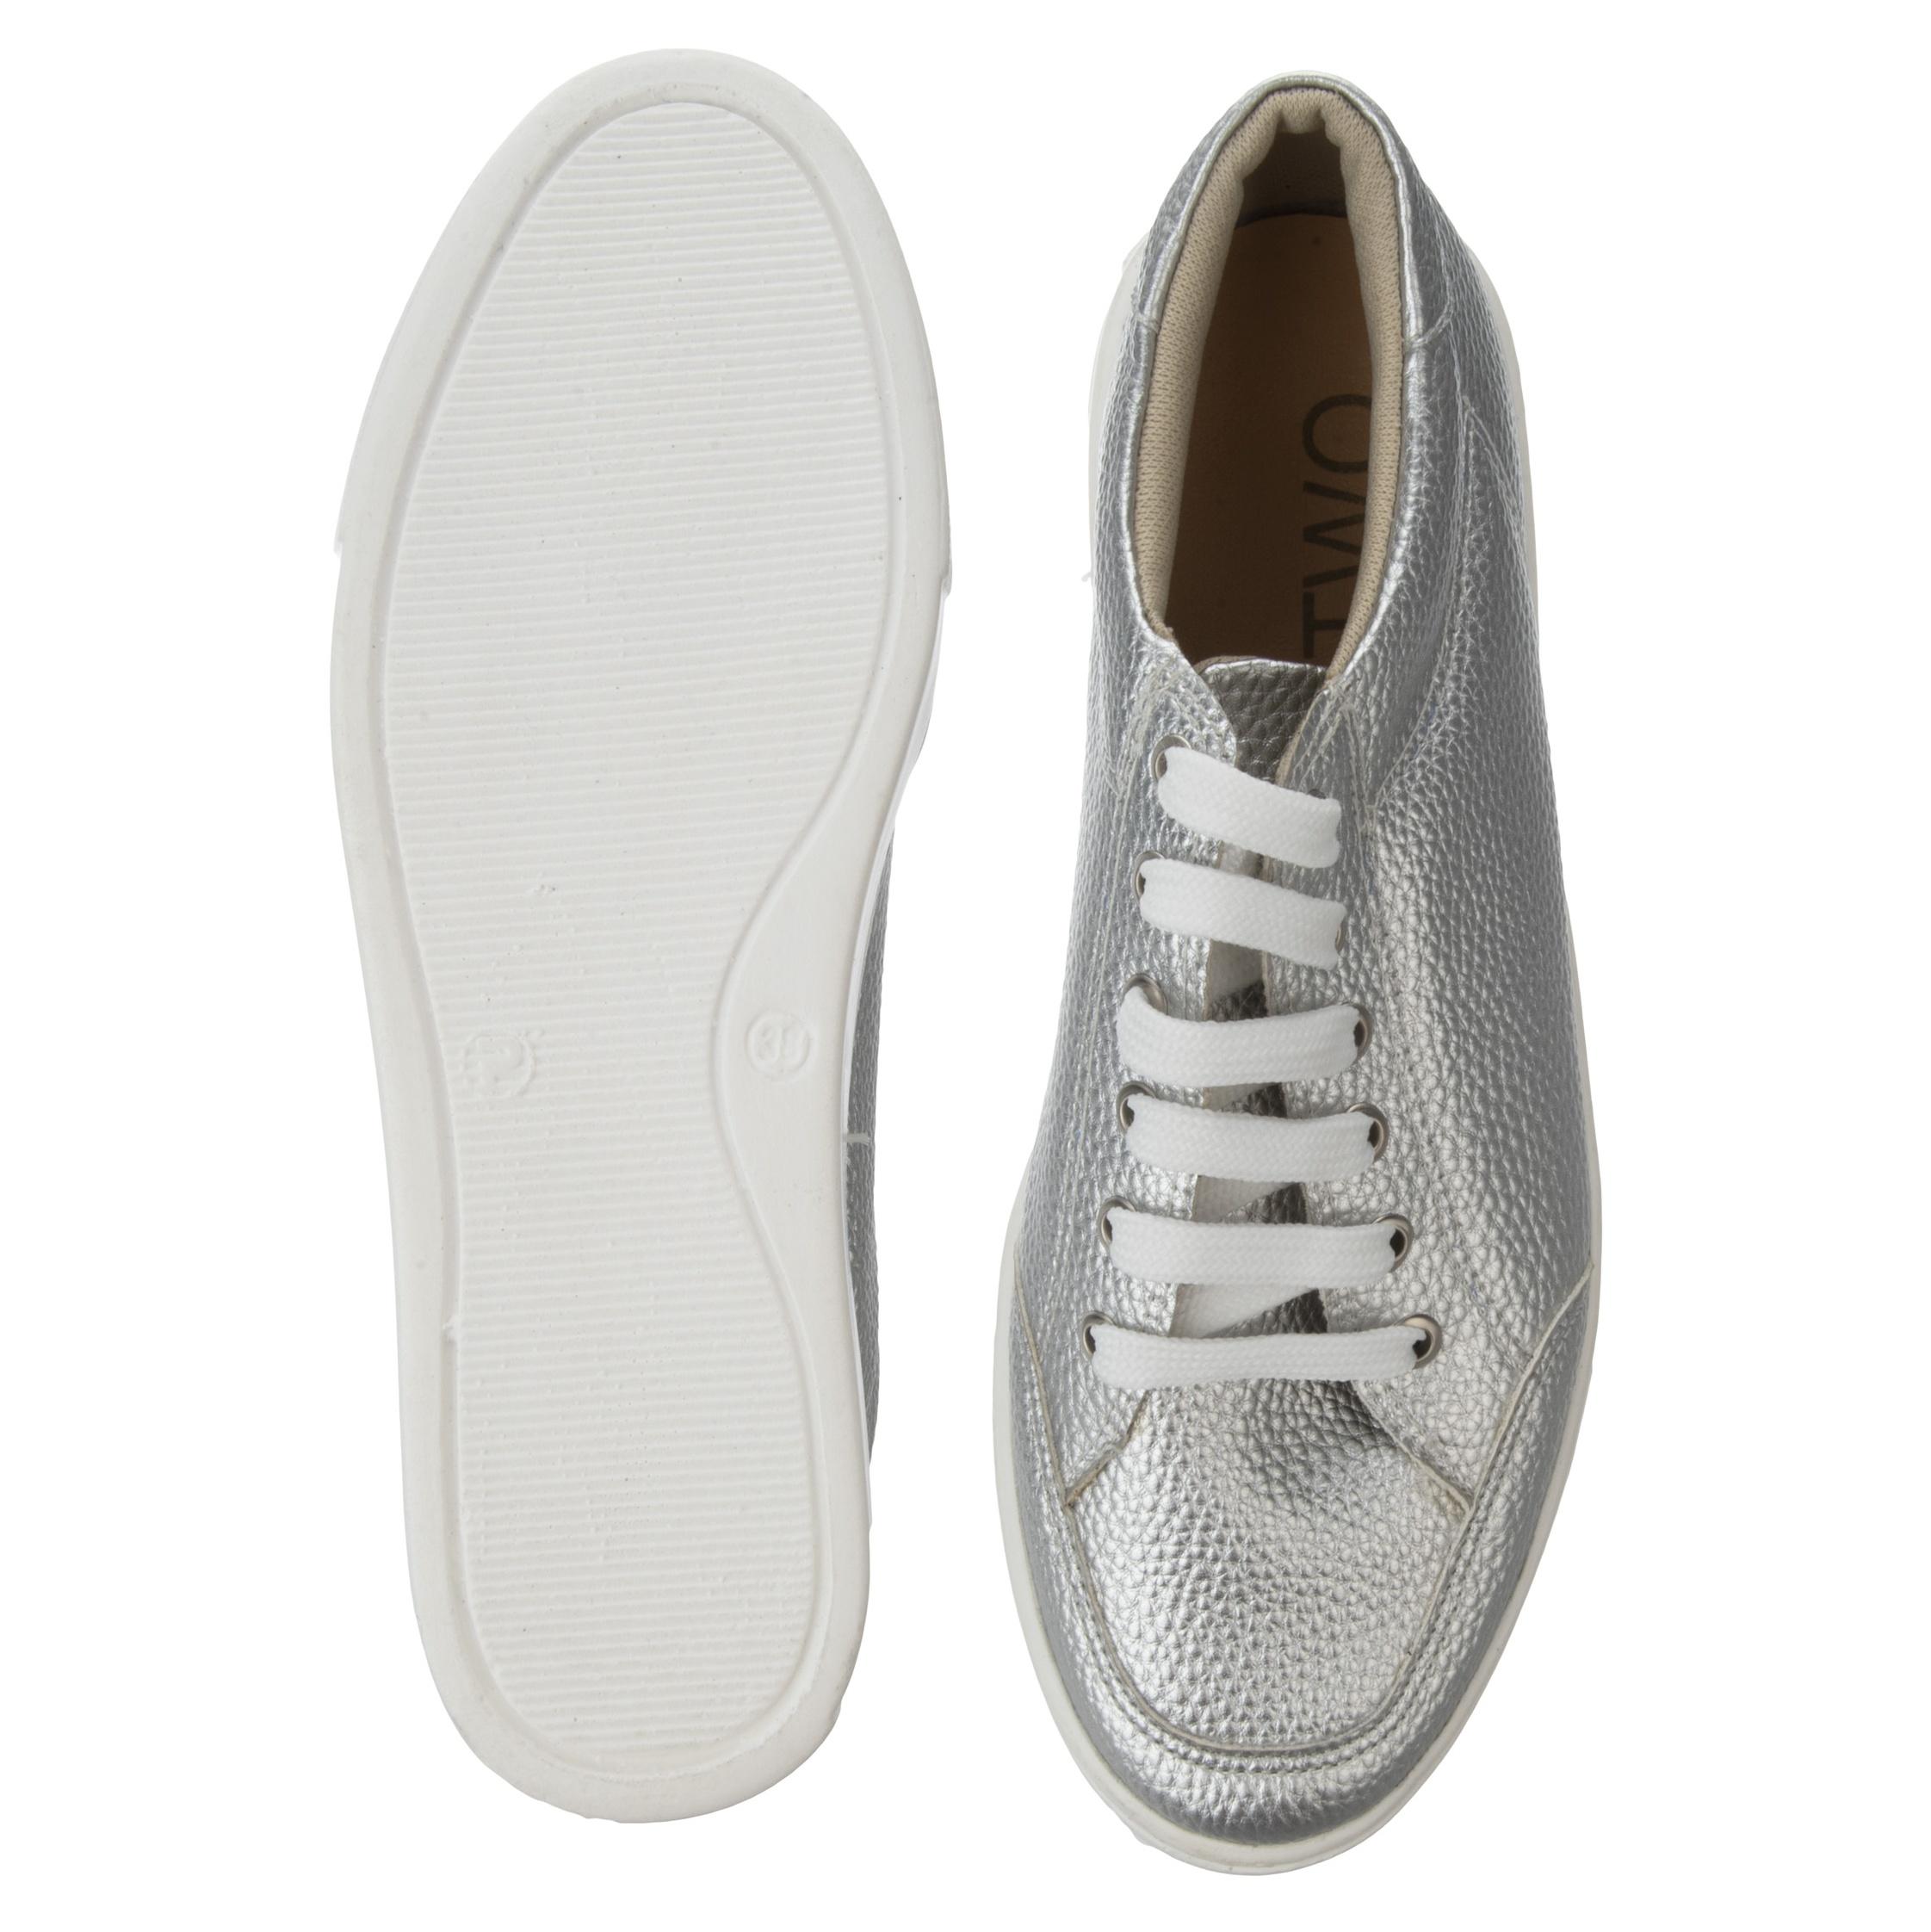 کفش روزمره نه ام تو مدل 604-0017